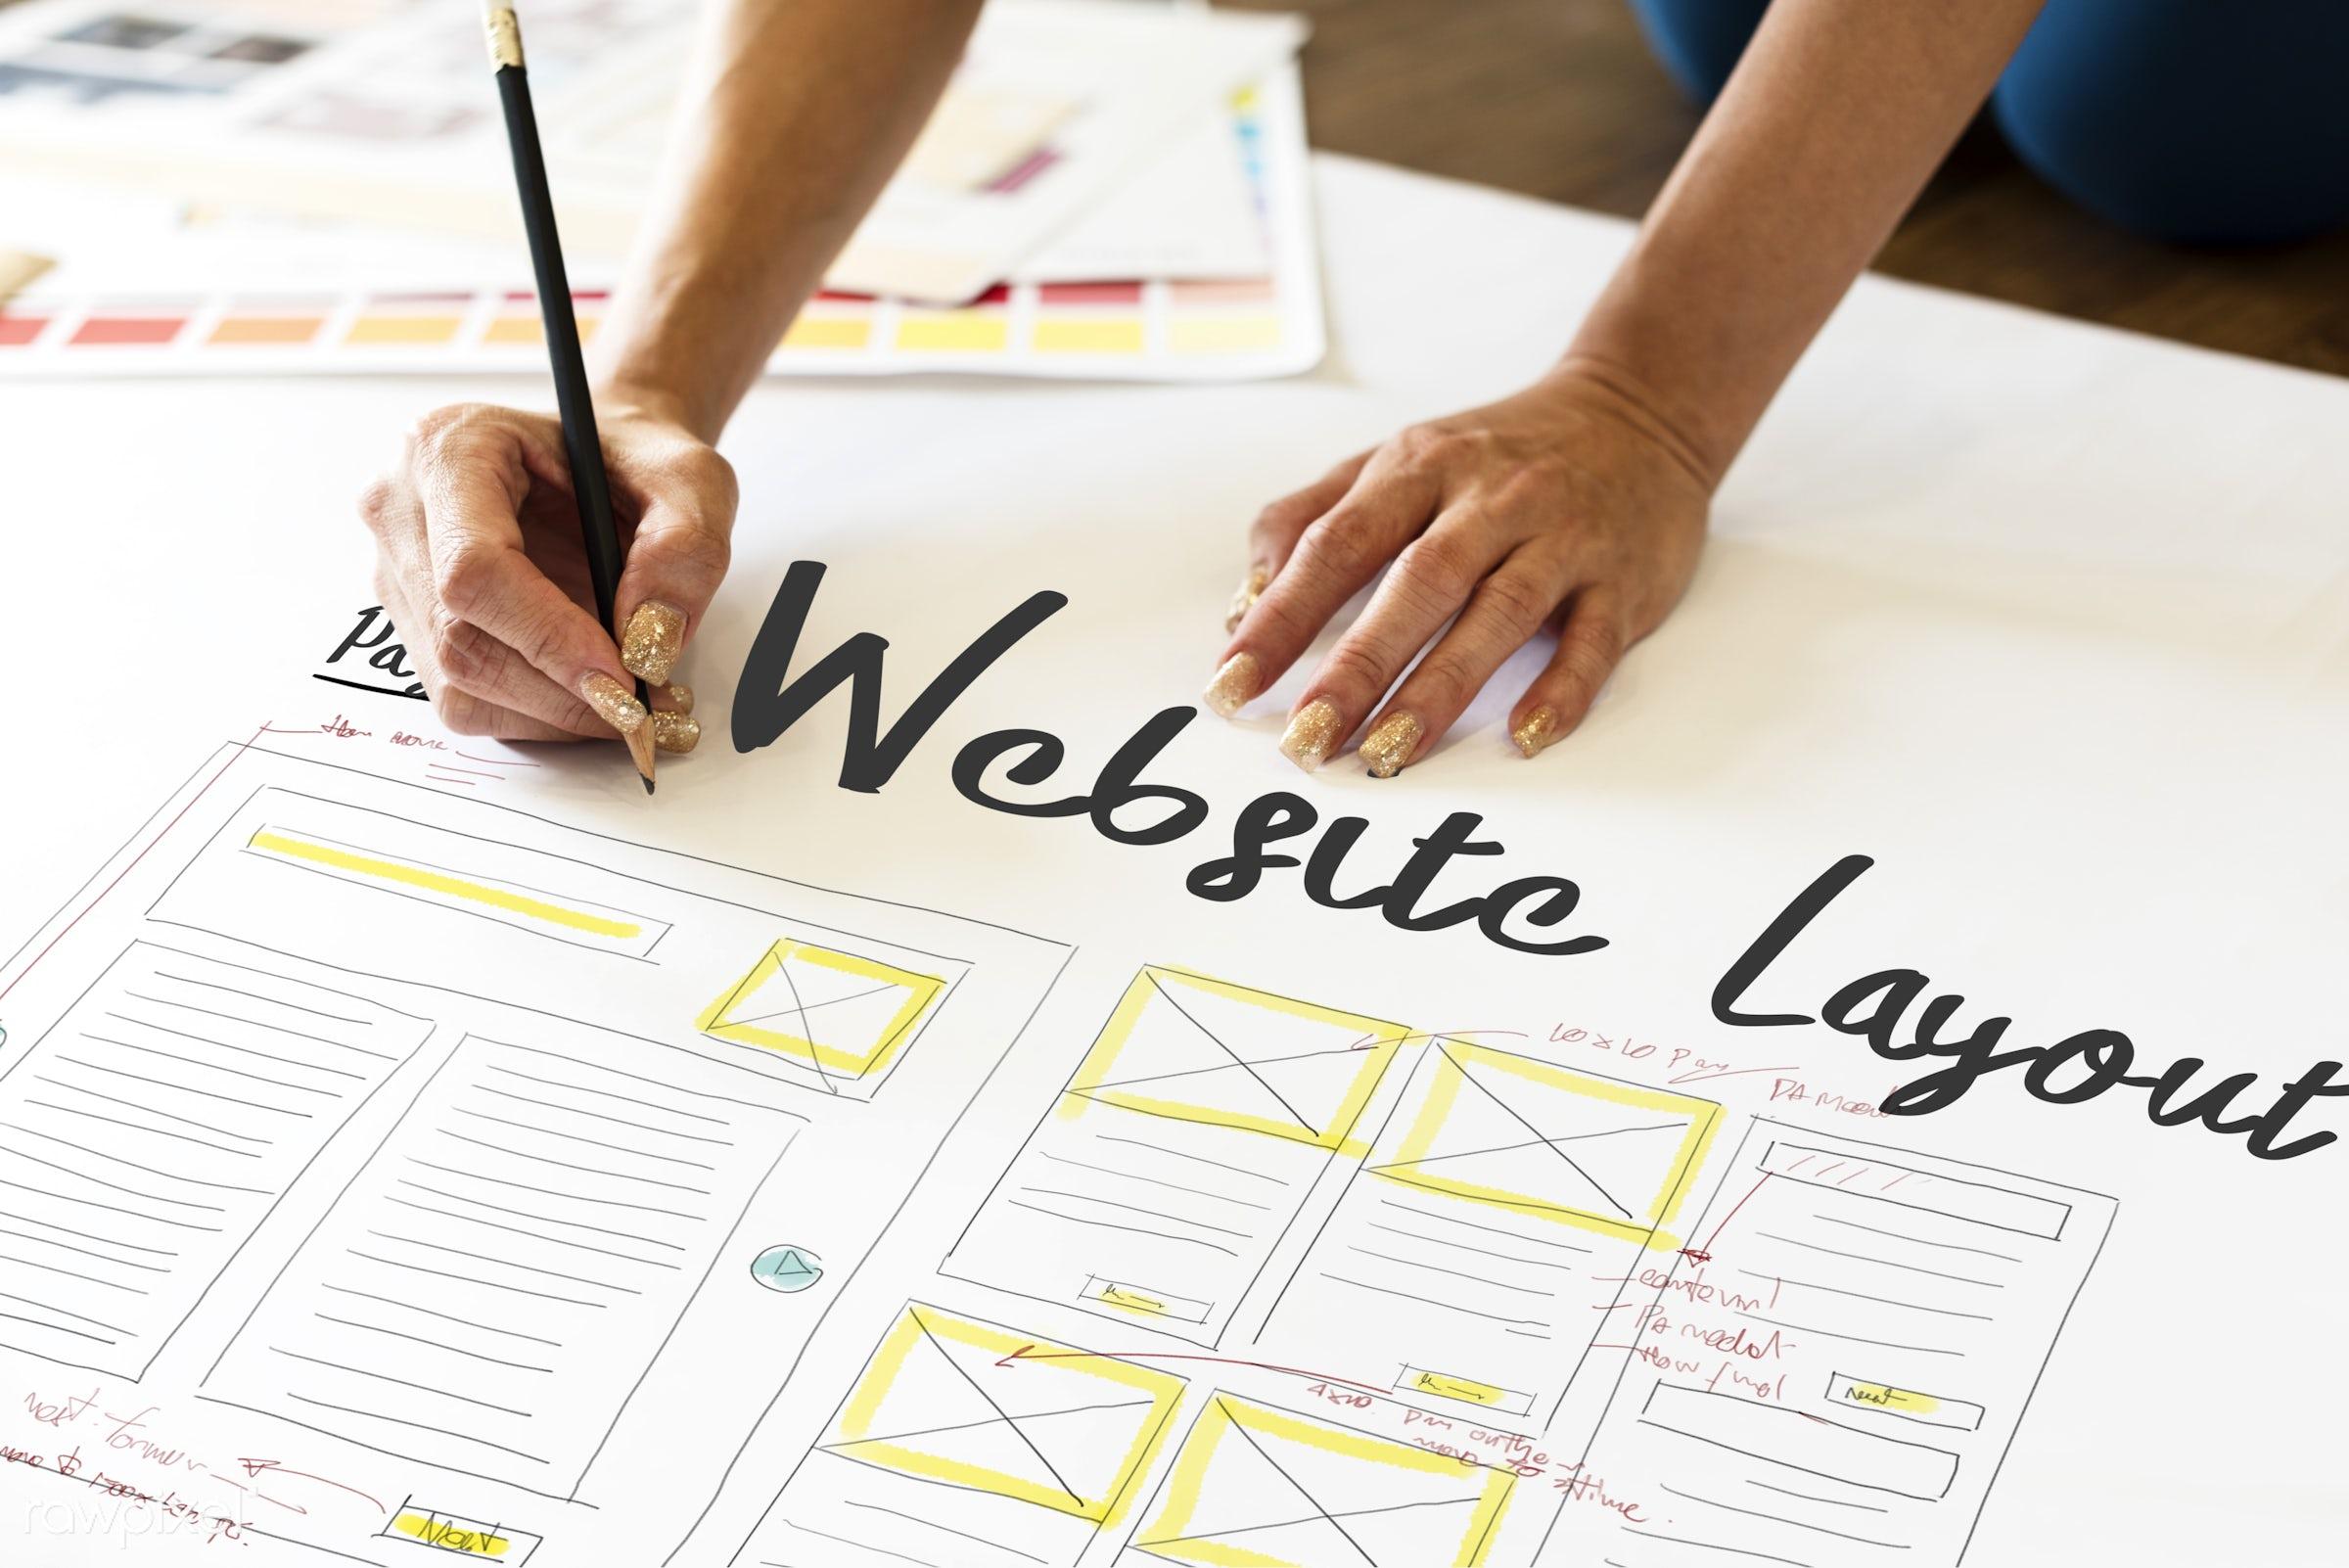 art, blog, blogging, coding, creation, creative, creativity, design, develop, drawing, hands, homepage, ideas, inspiration,...